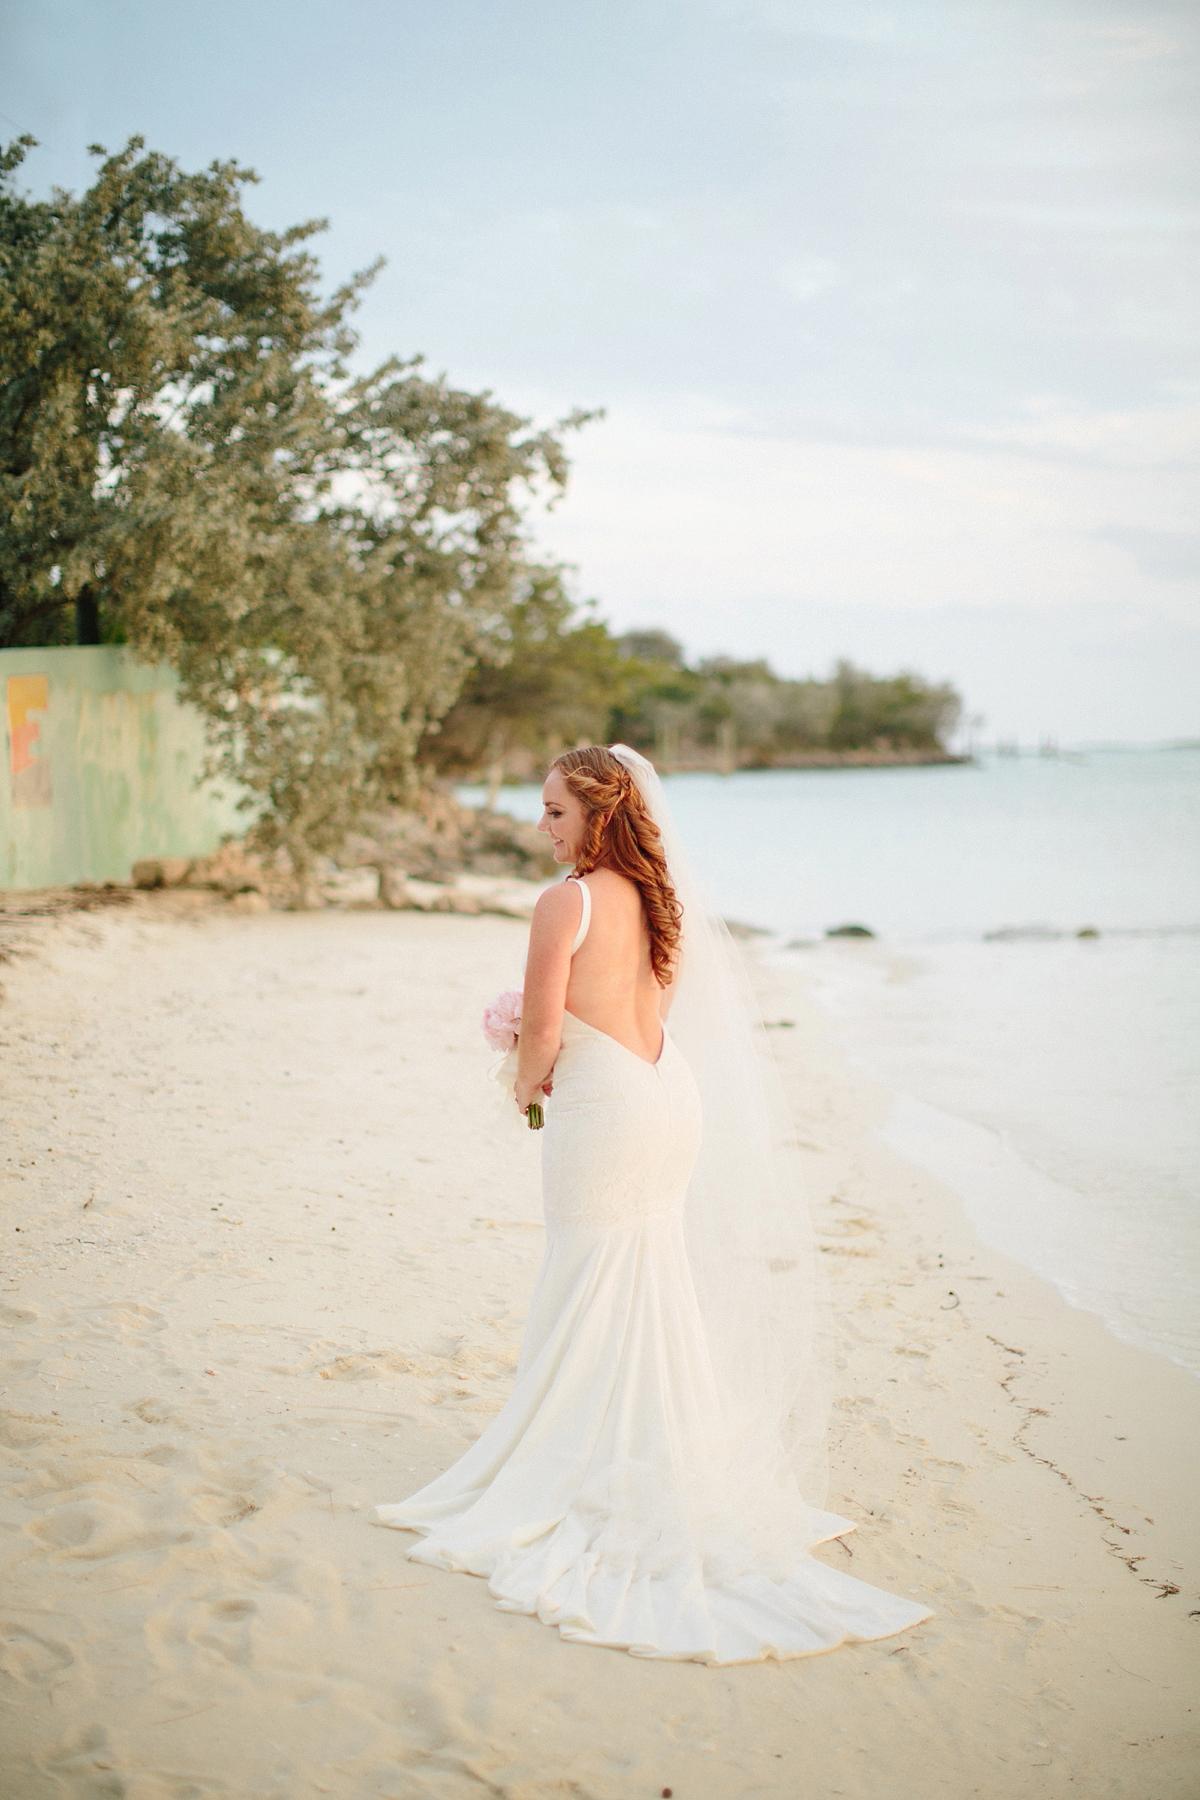 bahamas-destination-wedding-photographer-island-private-ceremony-staniel-cay_0039.jpg